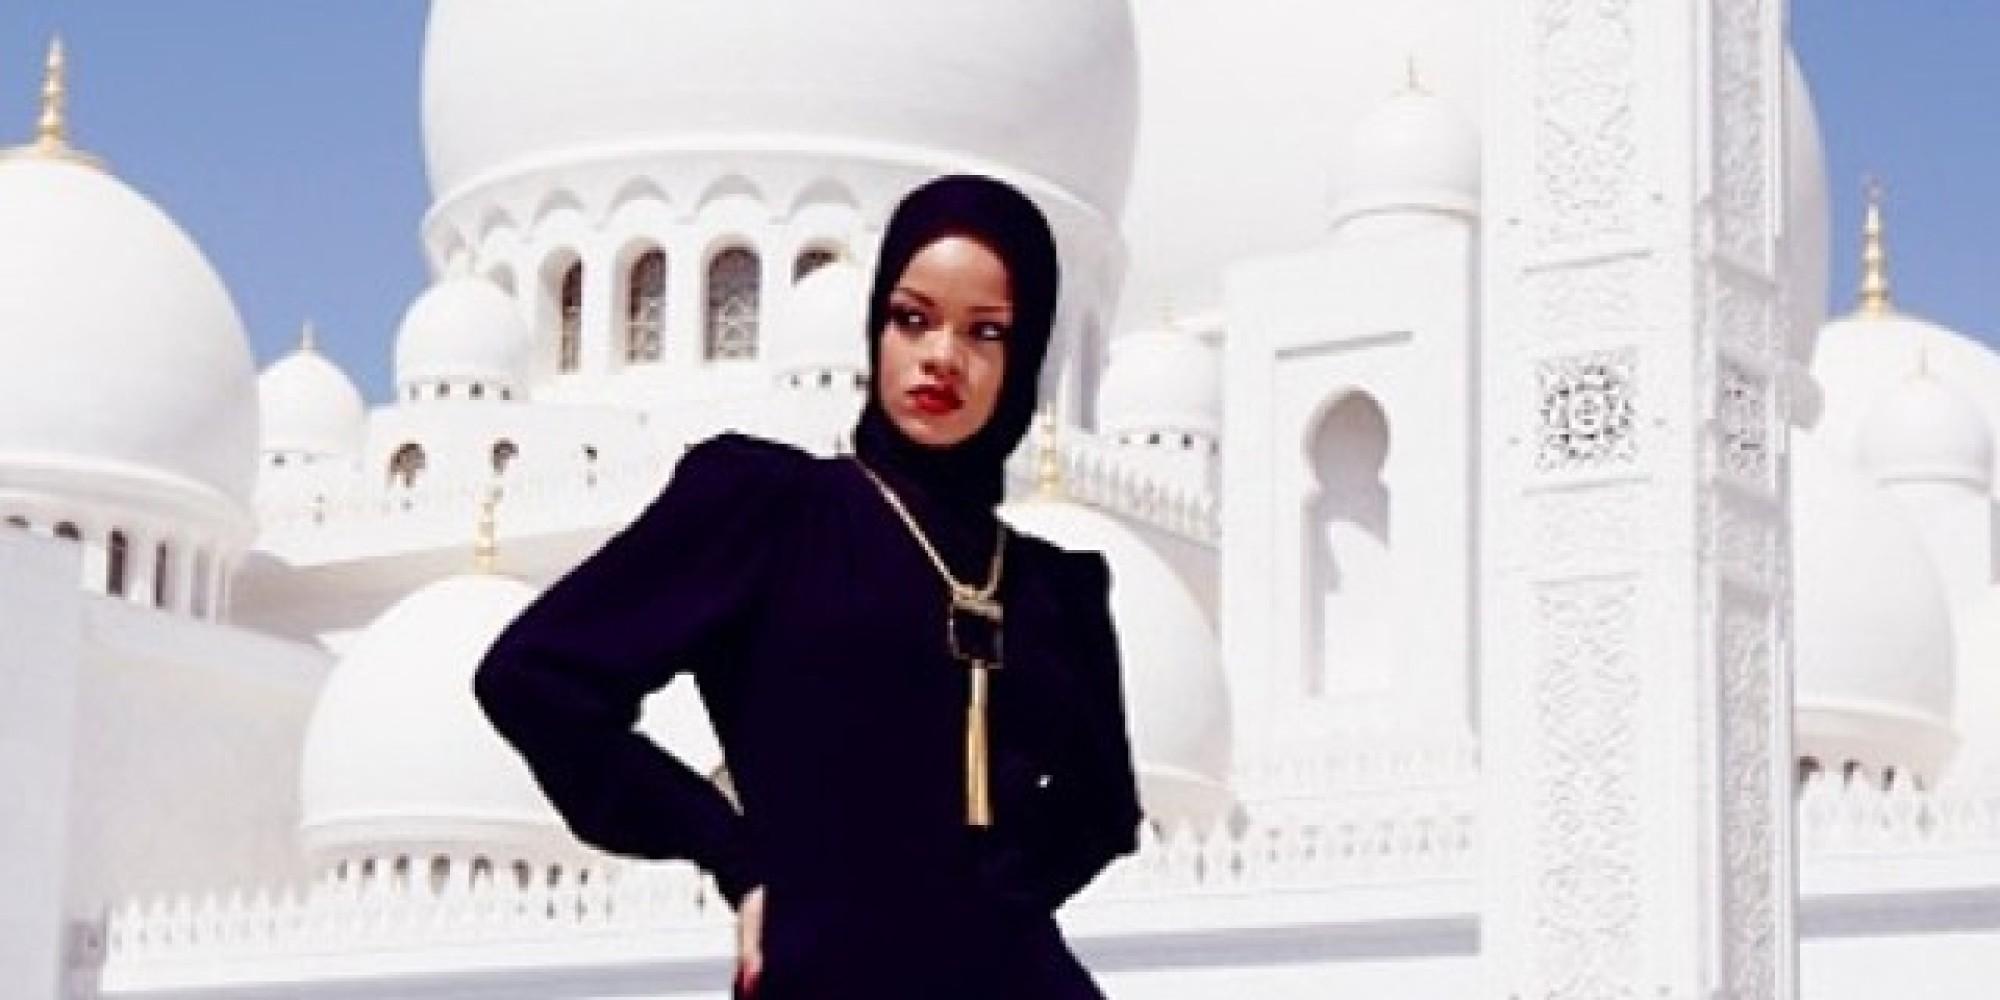 religion de emiratos arabes unidos yahoo dating